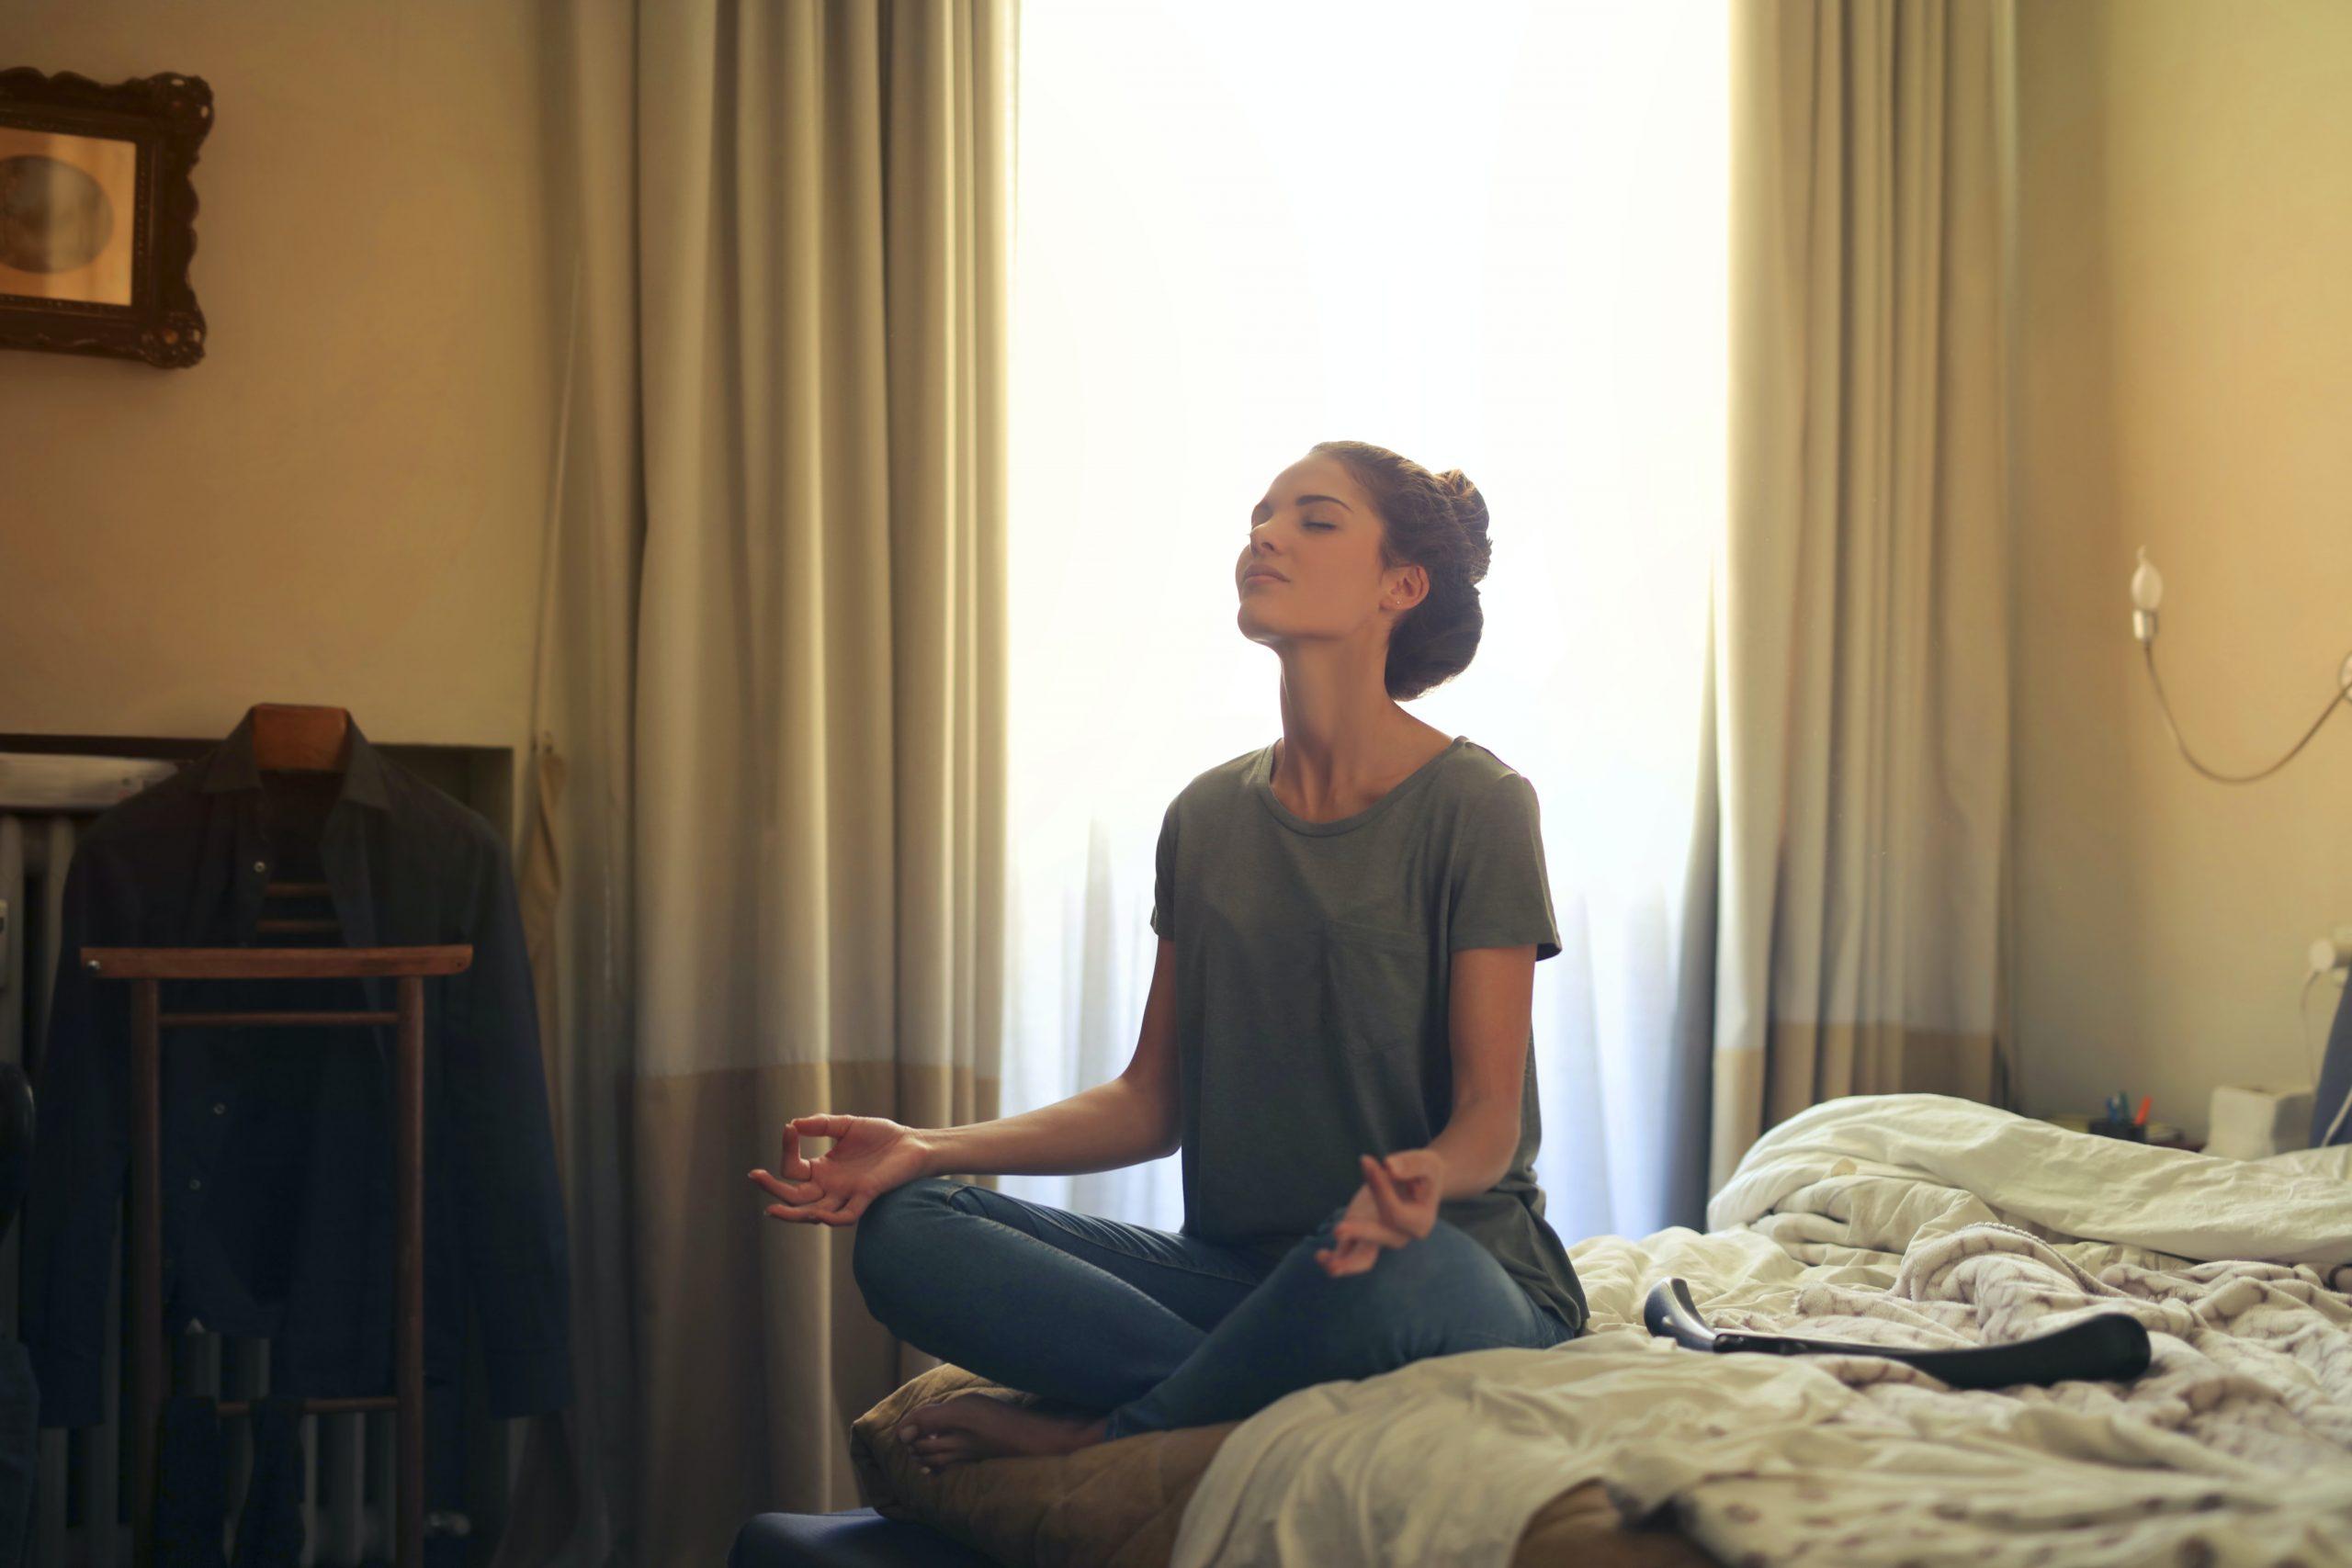 jutarnja-meditacija-slowage365